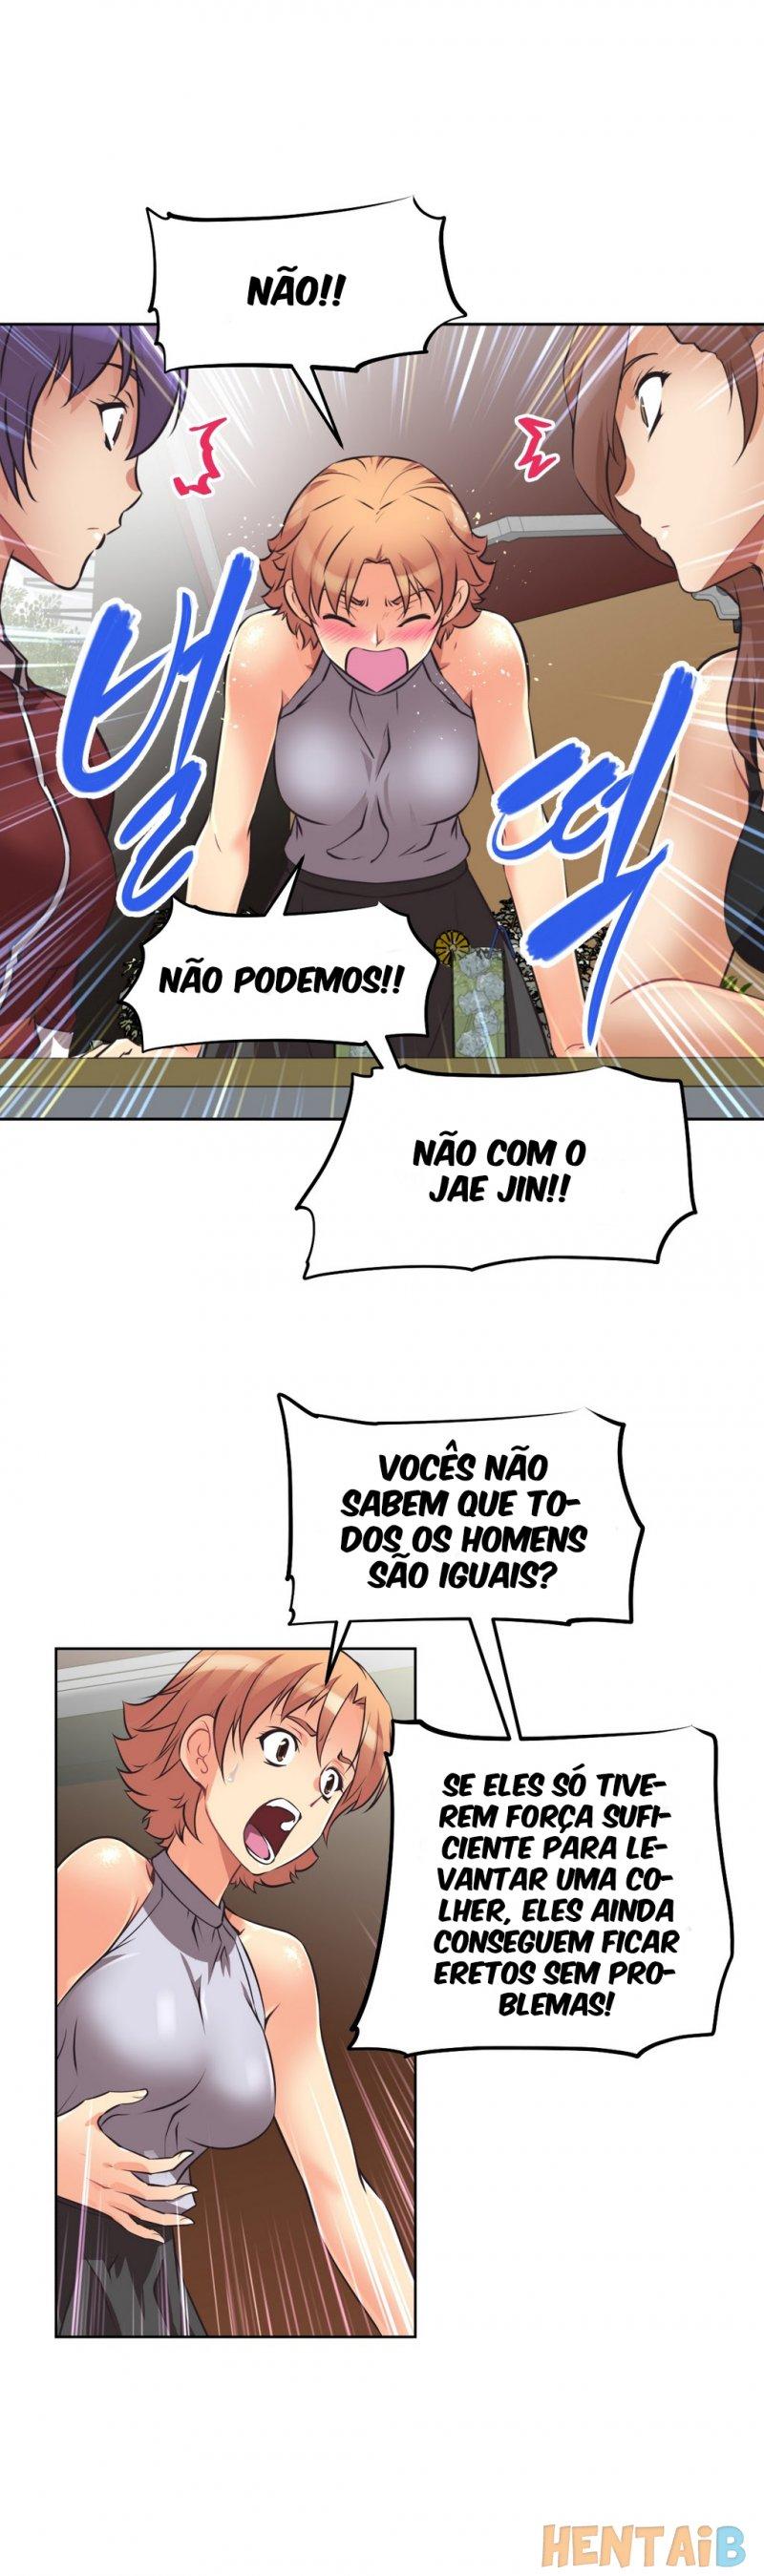 brawling go 06 8 hentai brasil hq - Brawling Go! #06 Hentai HQ